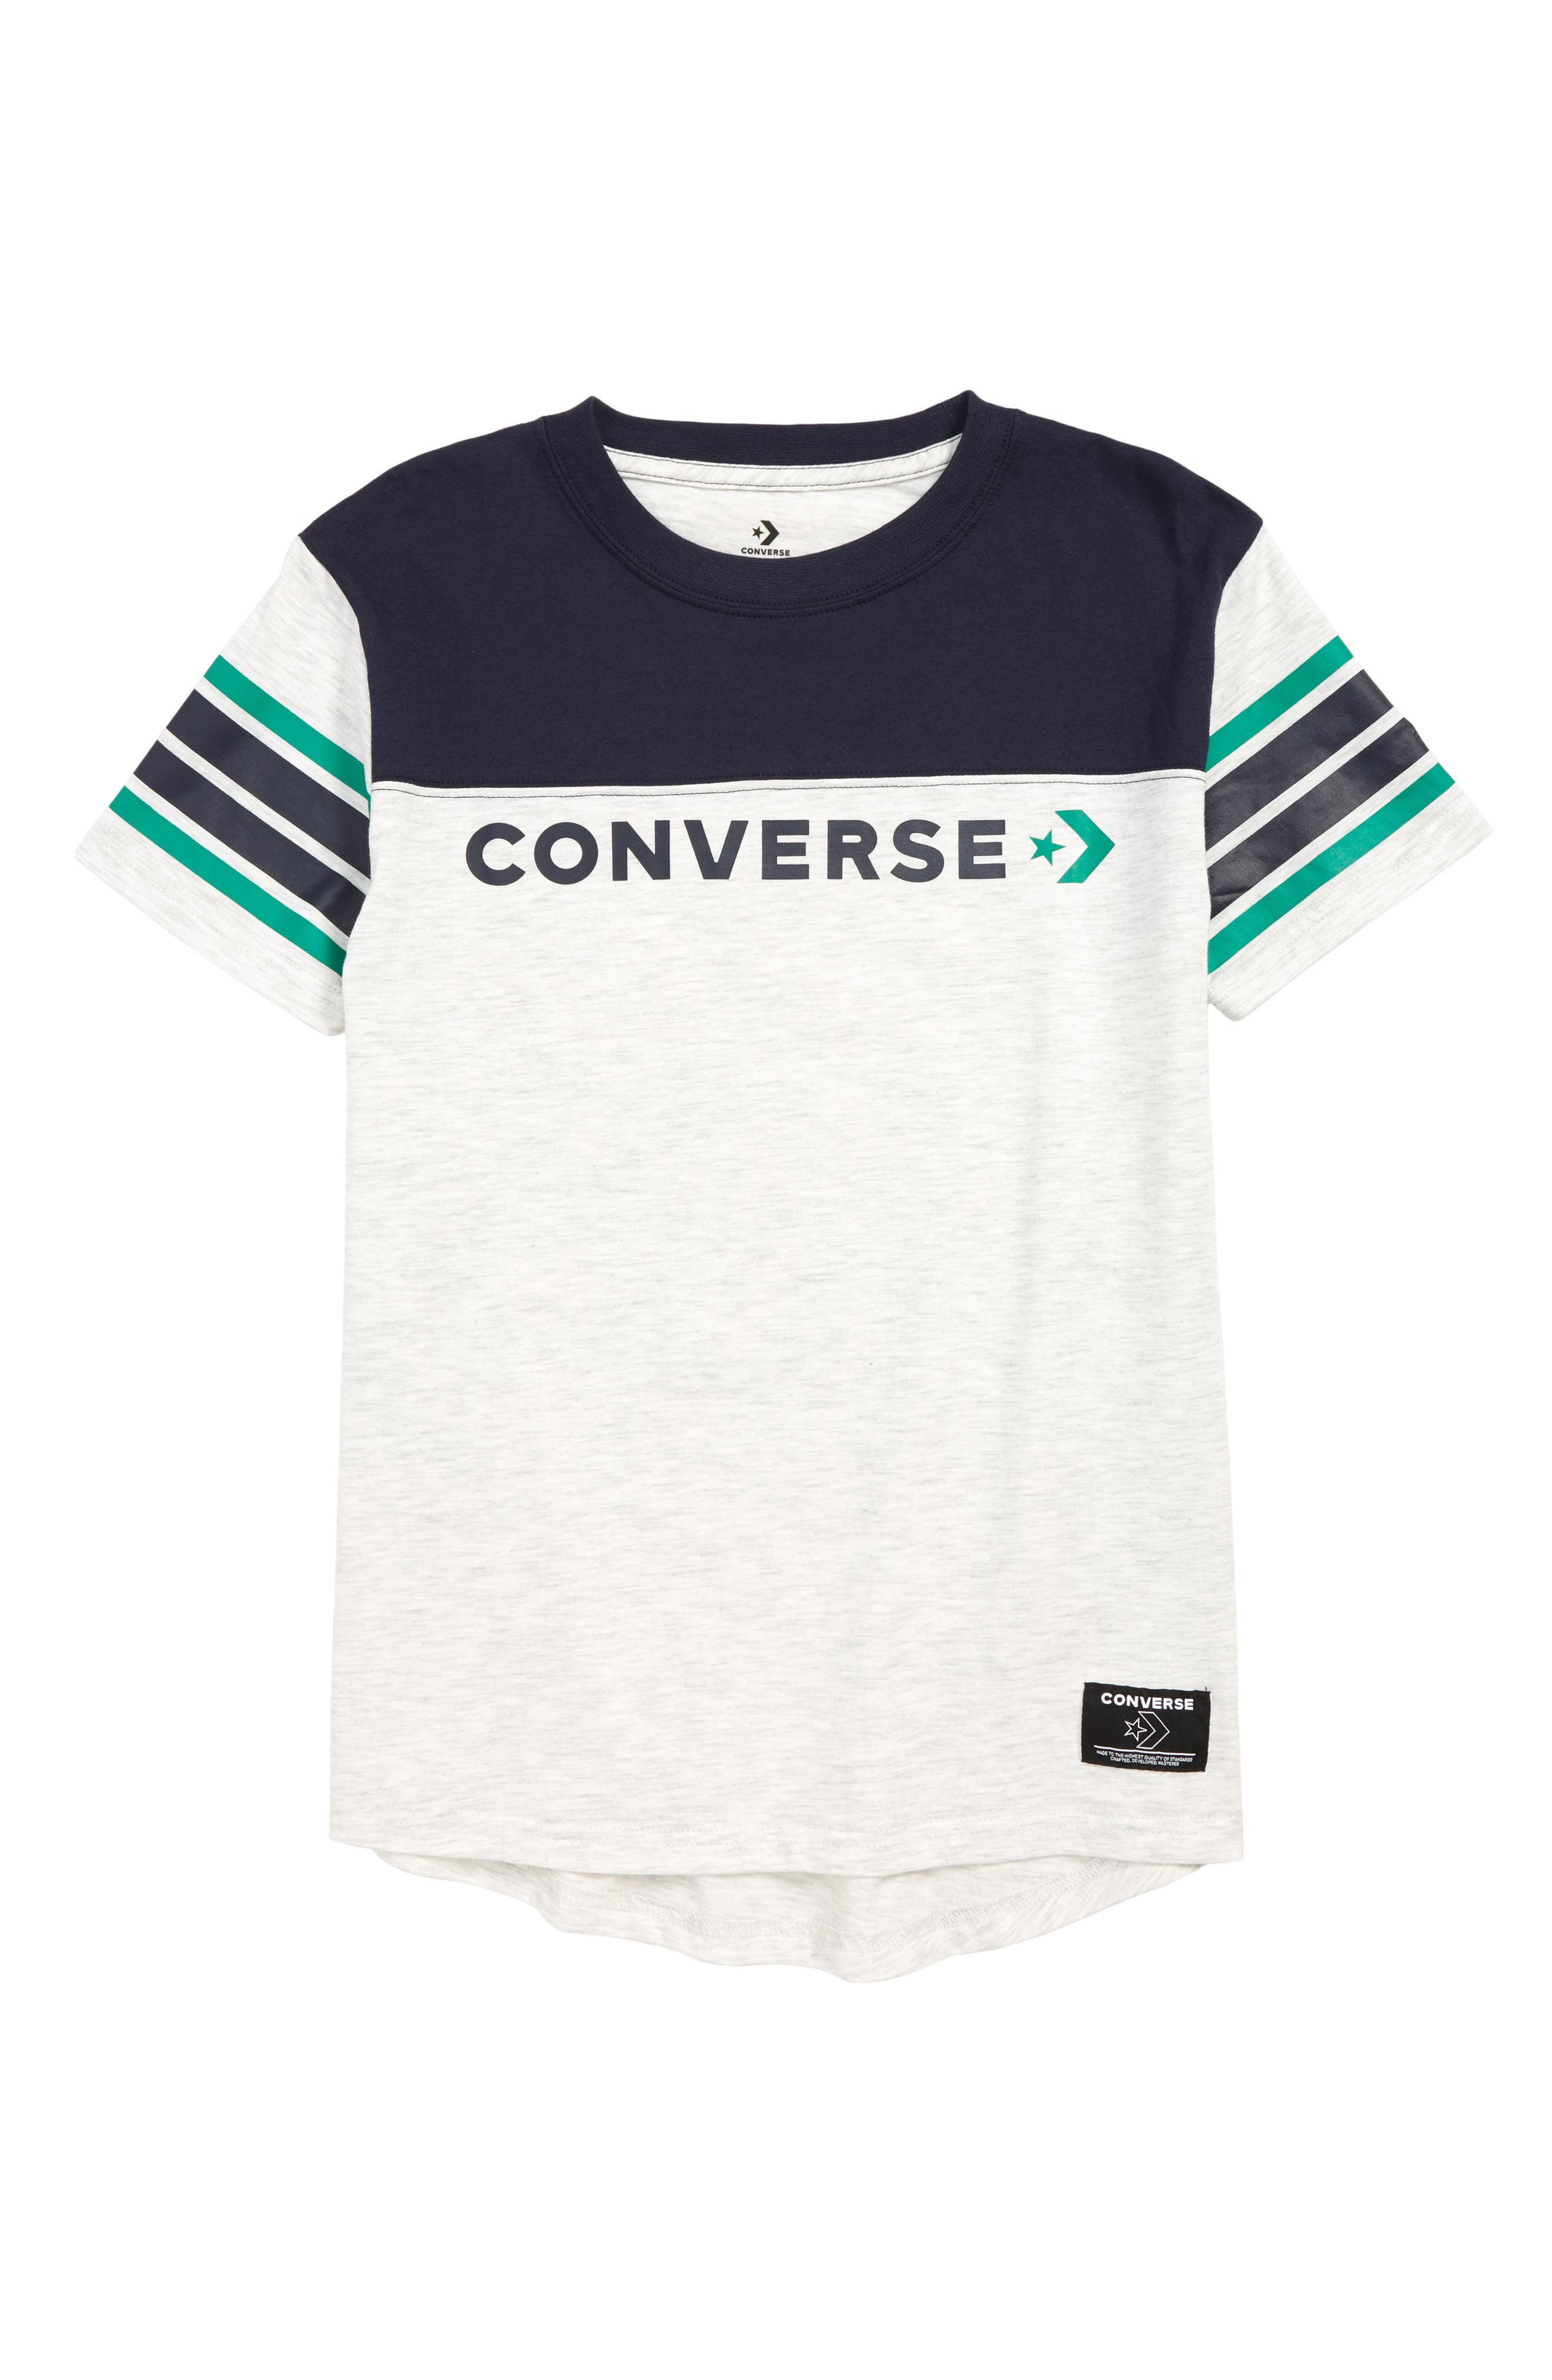 CONVERSE, Retro Graphic T-Shirt, Main thumbnail 1, color, BIRCH HEATHER